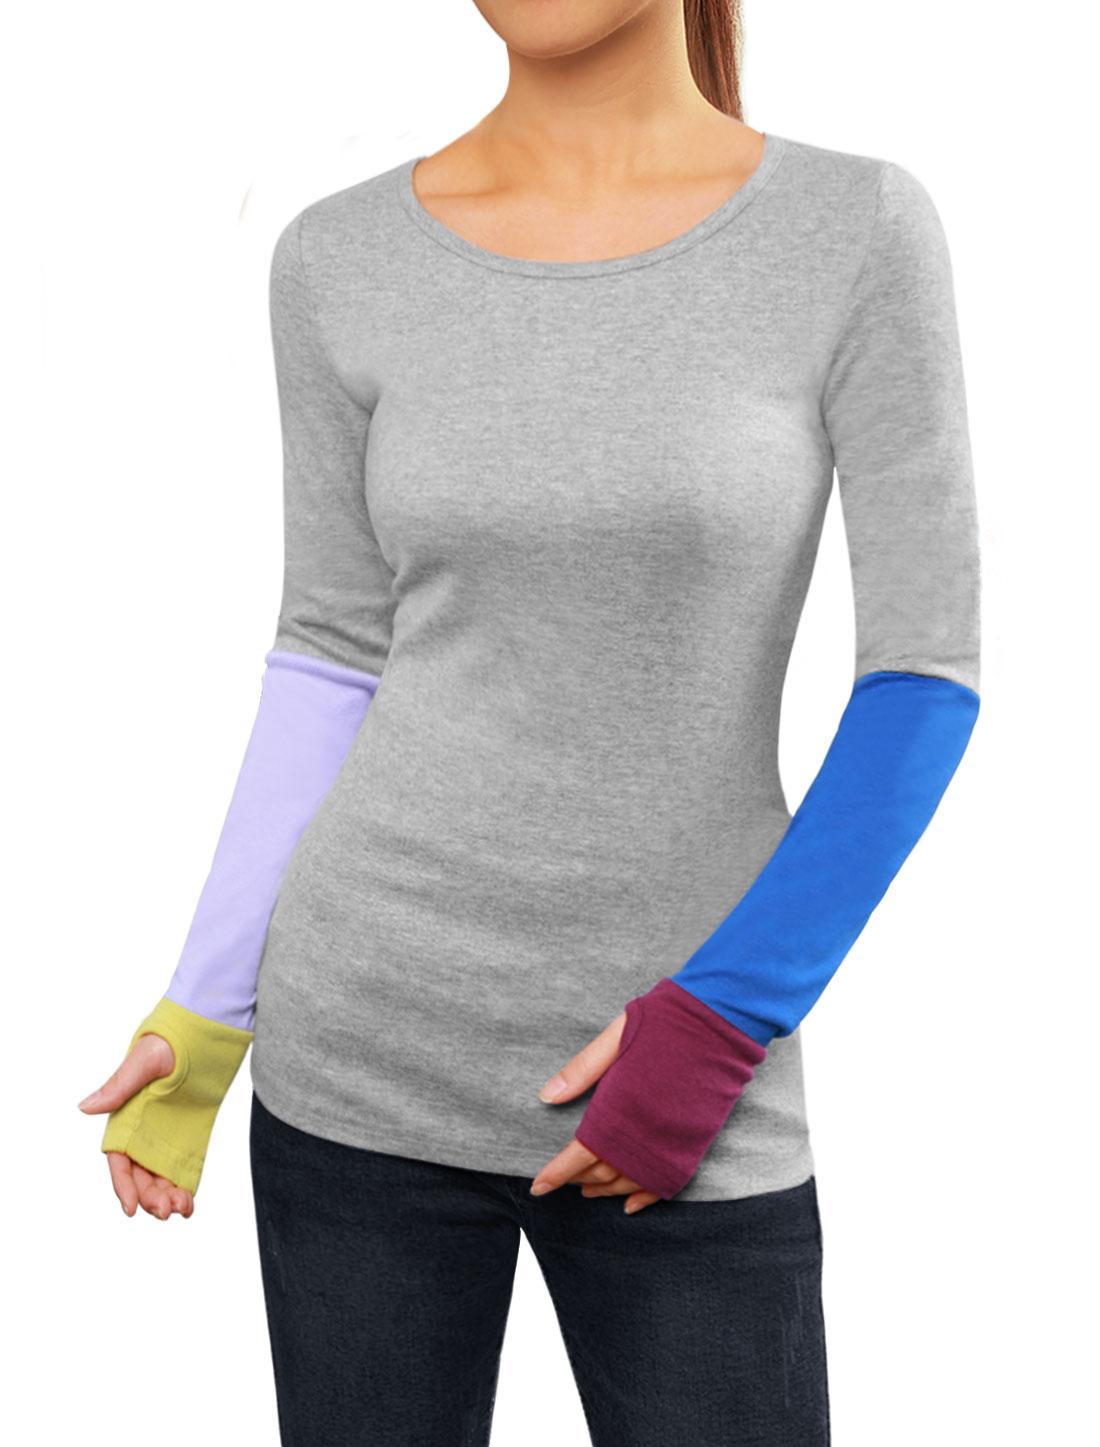 Woman Color Block Long Sleeves T-Shirt w Thumb Hole Gray XL